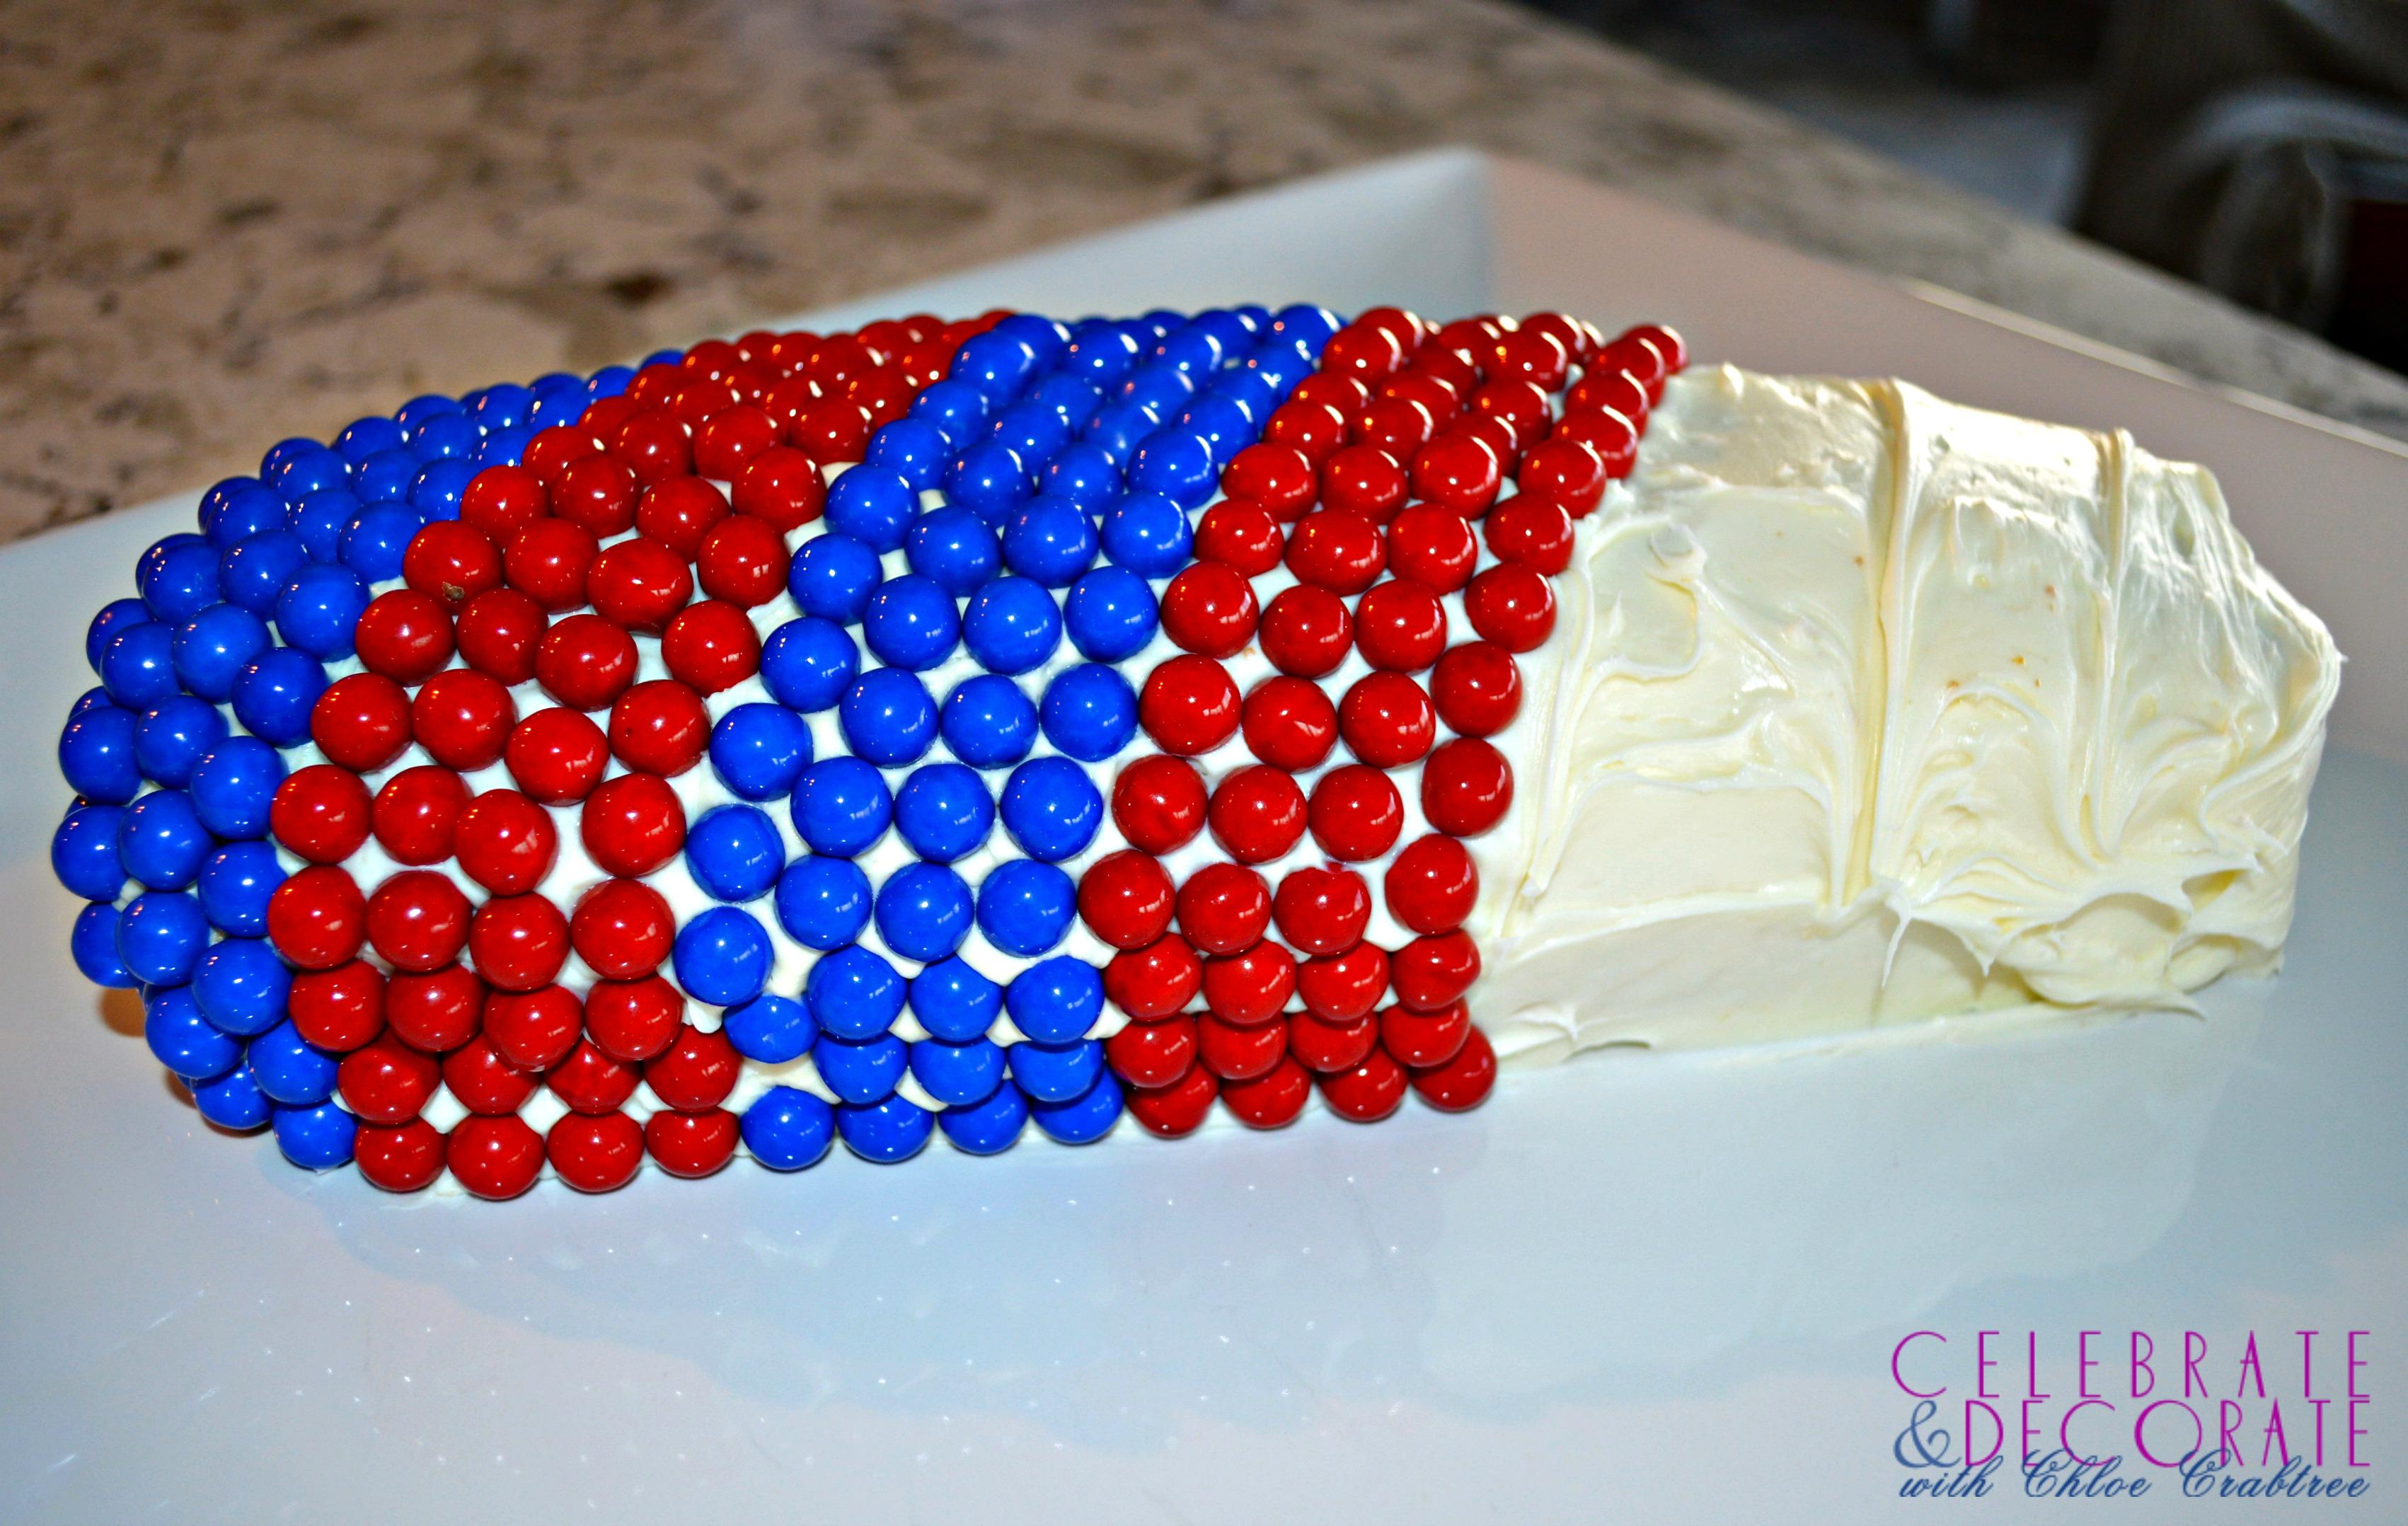 Firecracker-cake